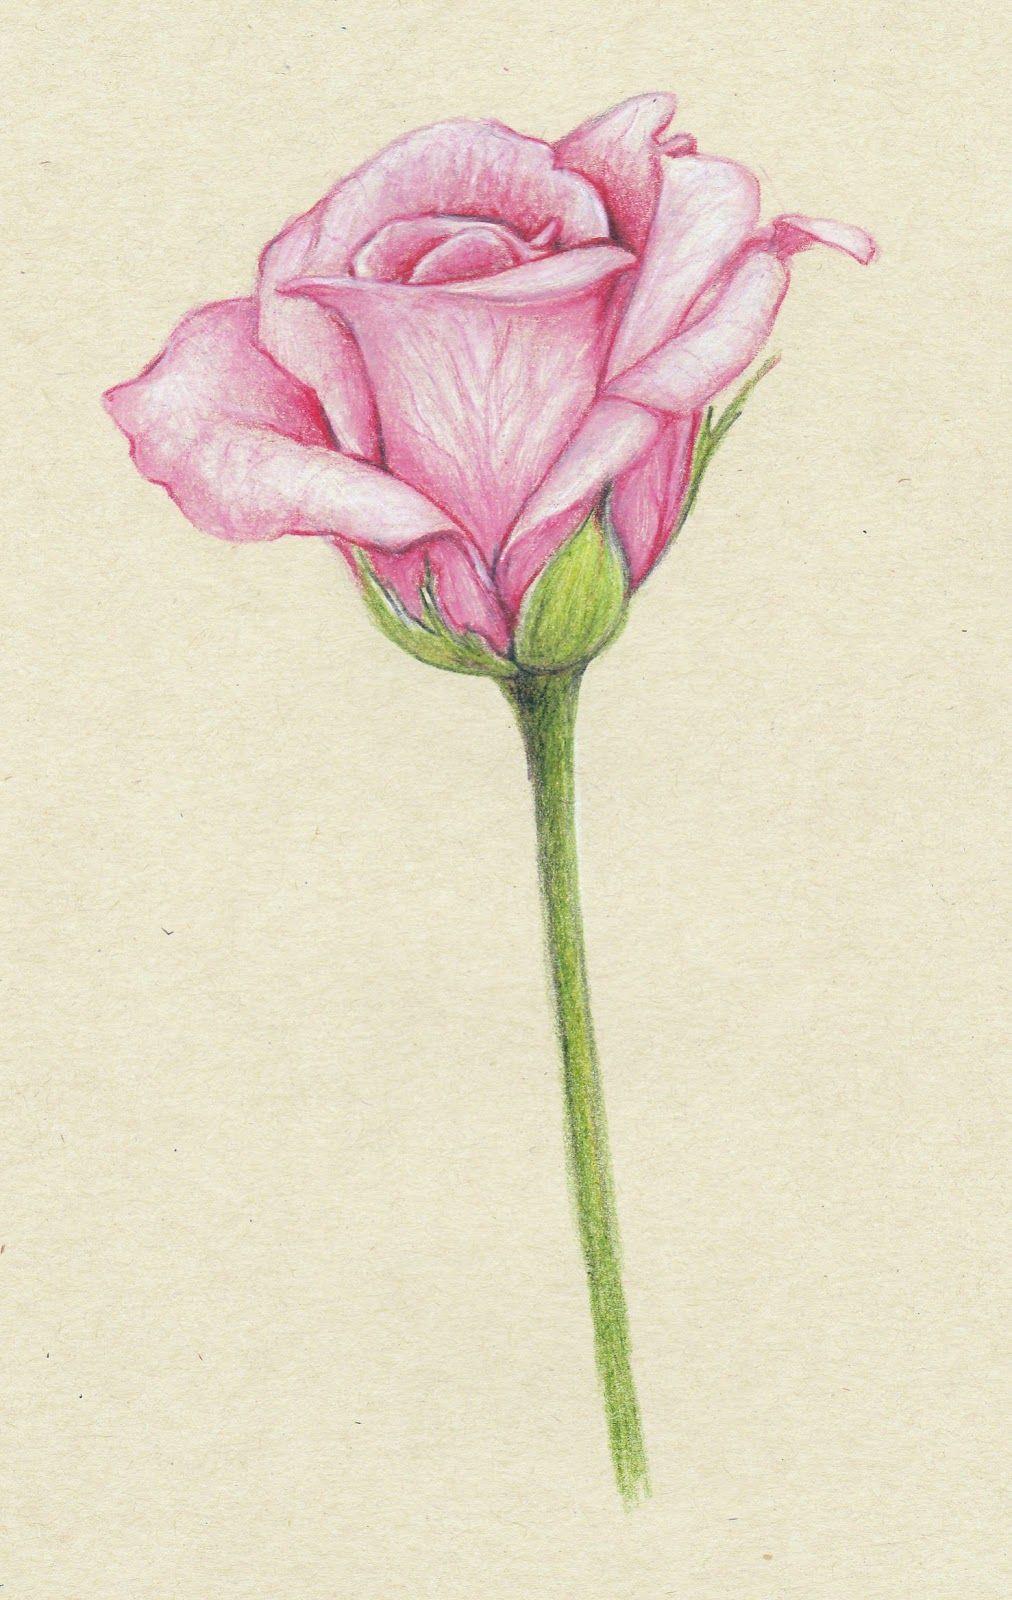 Pencil Drawings Of Flowers Pink Roses Pencil Drawings Of